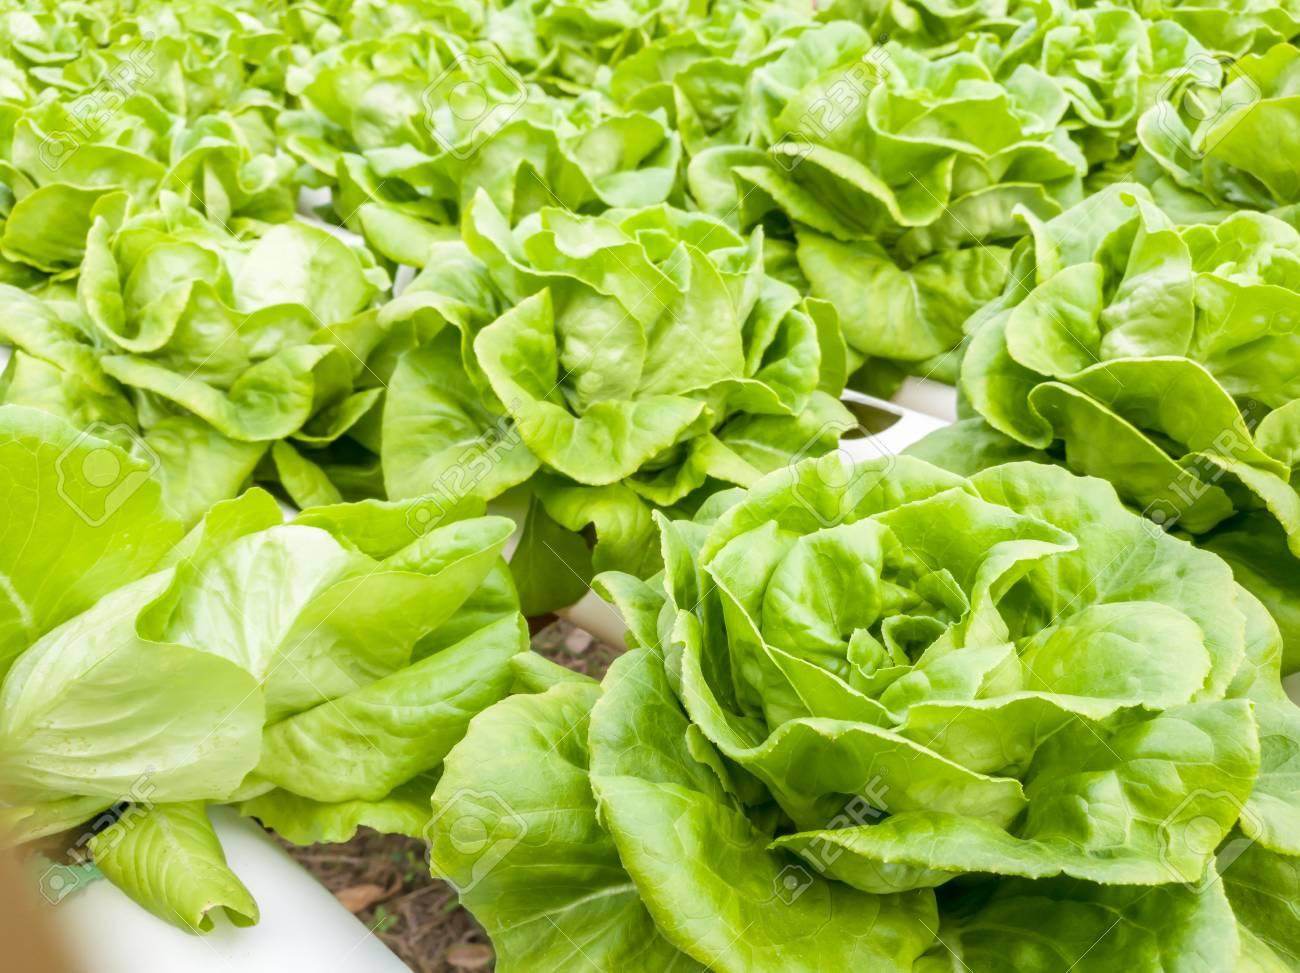 Salad vegetable green fresh lettuce in farm close up - 106236398